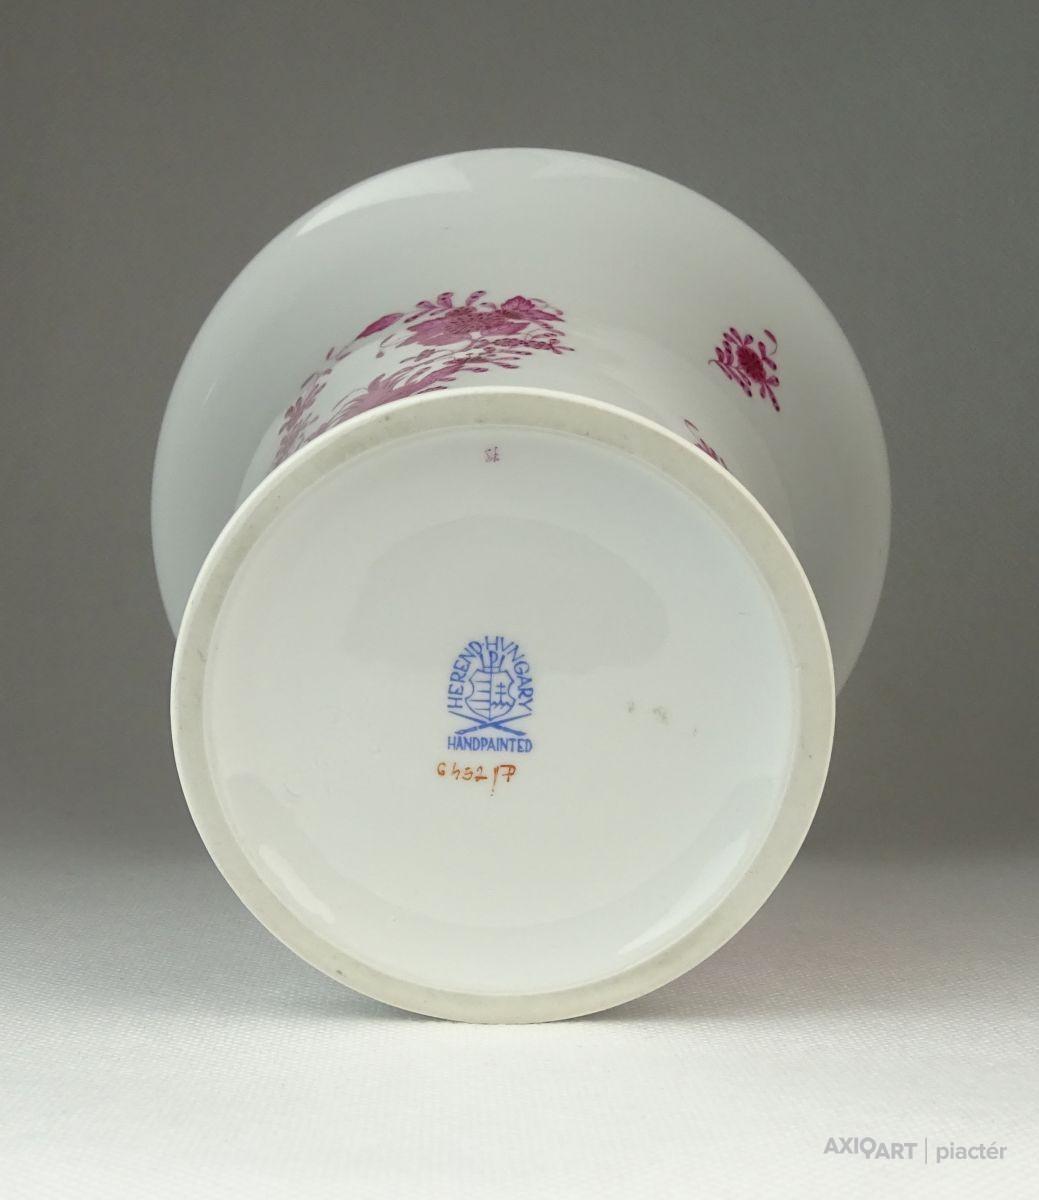 Lila indiai kosaras Herendi porcelán váza. Previous  Next 9f3a9a71ac